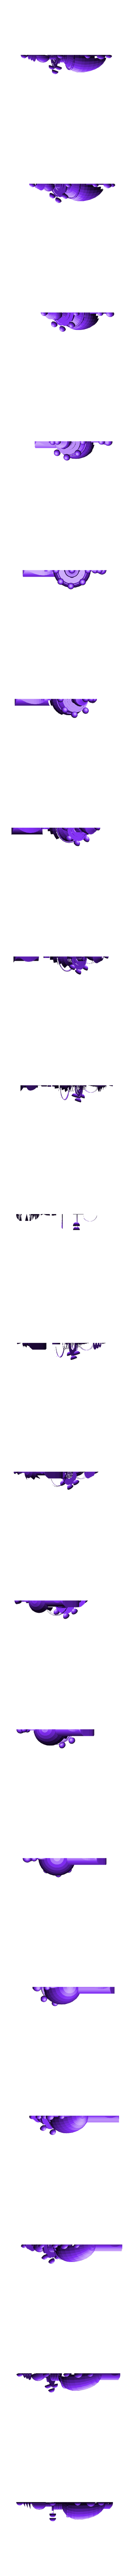 cotton candy gun left final.stl Download STL file killer klowns from outer space cotton candy gun • 3D printer object, drykill_23